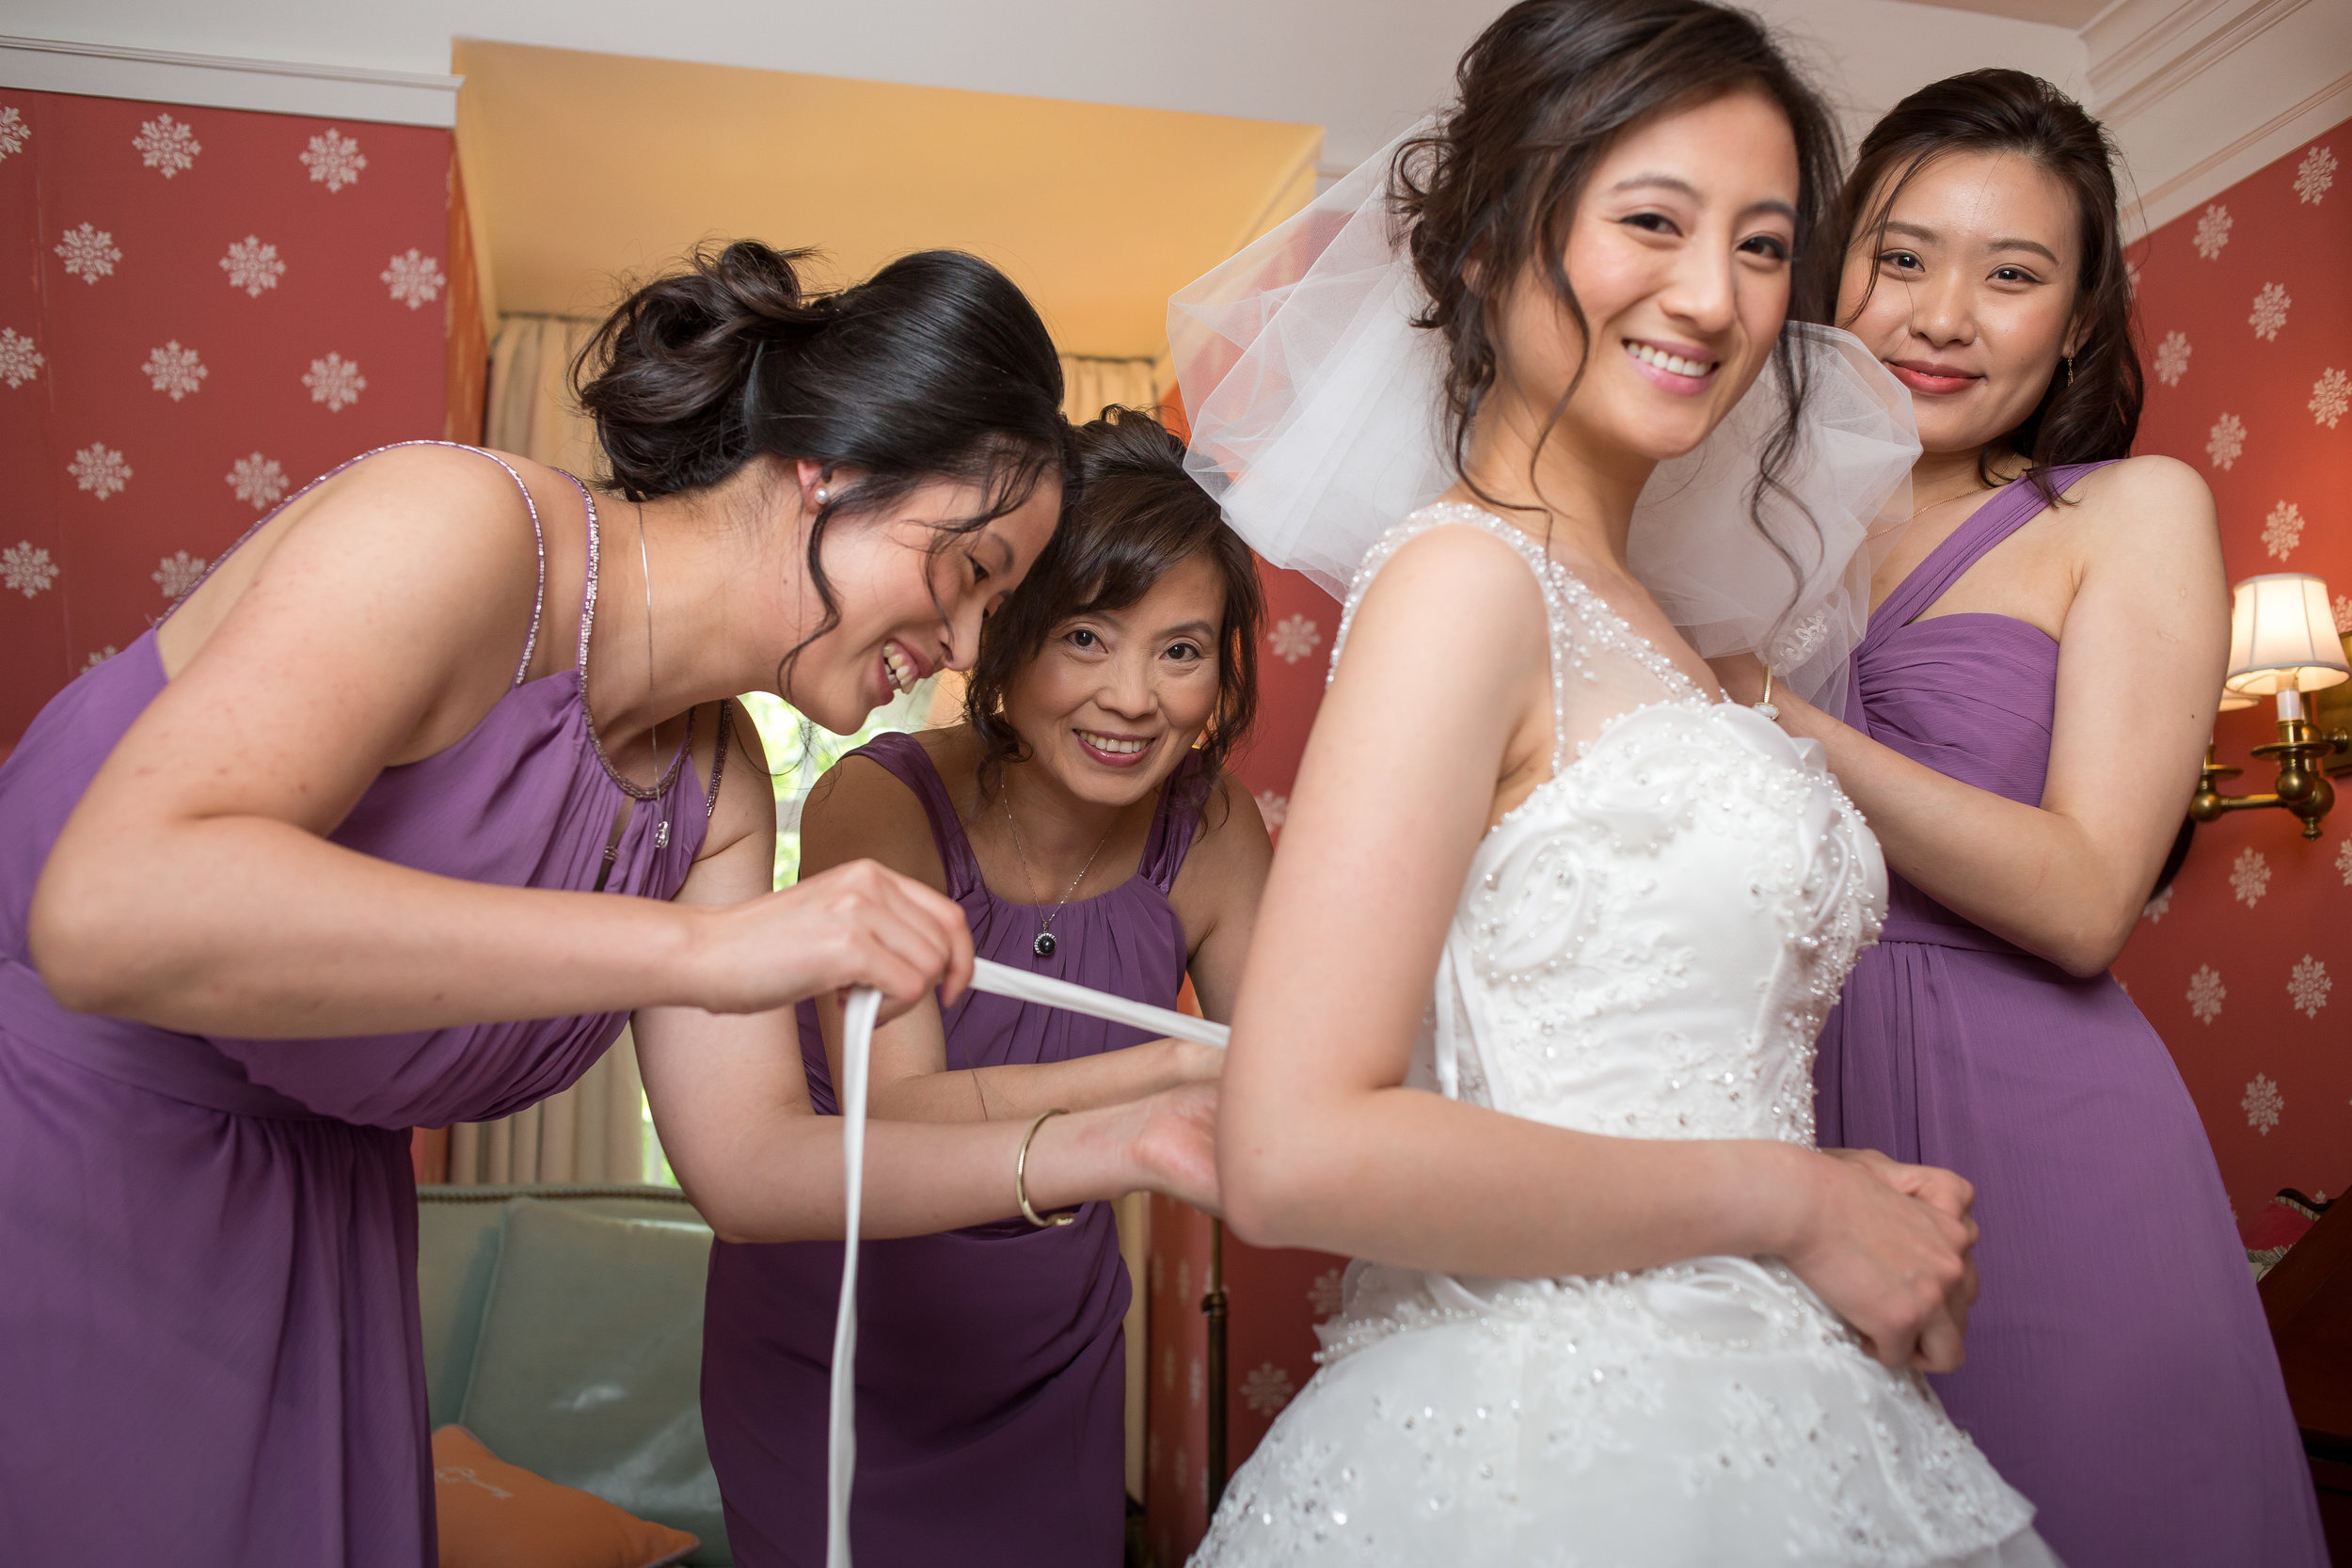 2017_04_30_jenny_jonathans_wedding_getting_ready-93.jpg